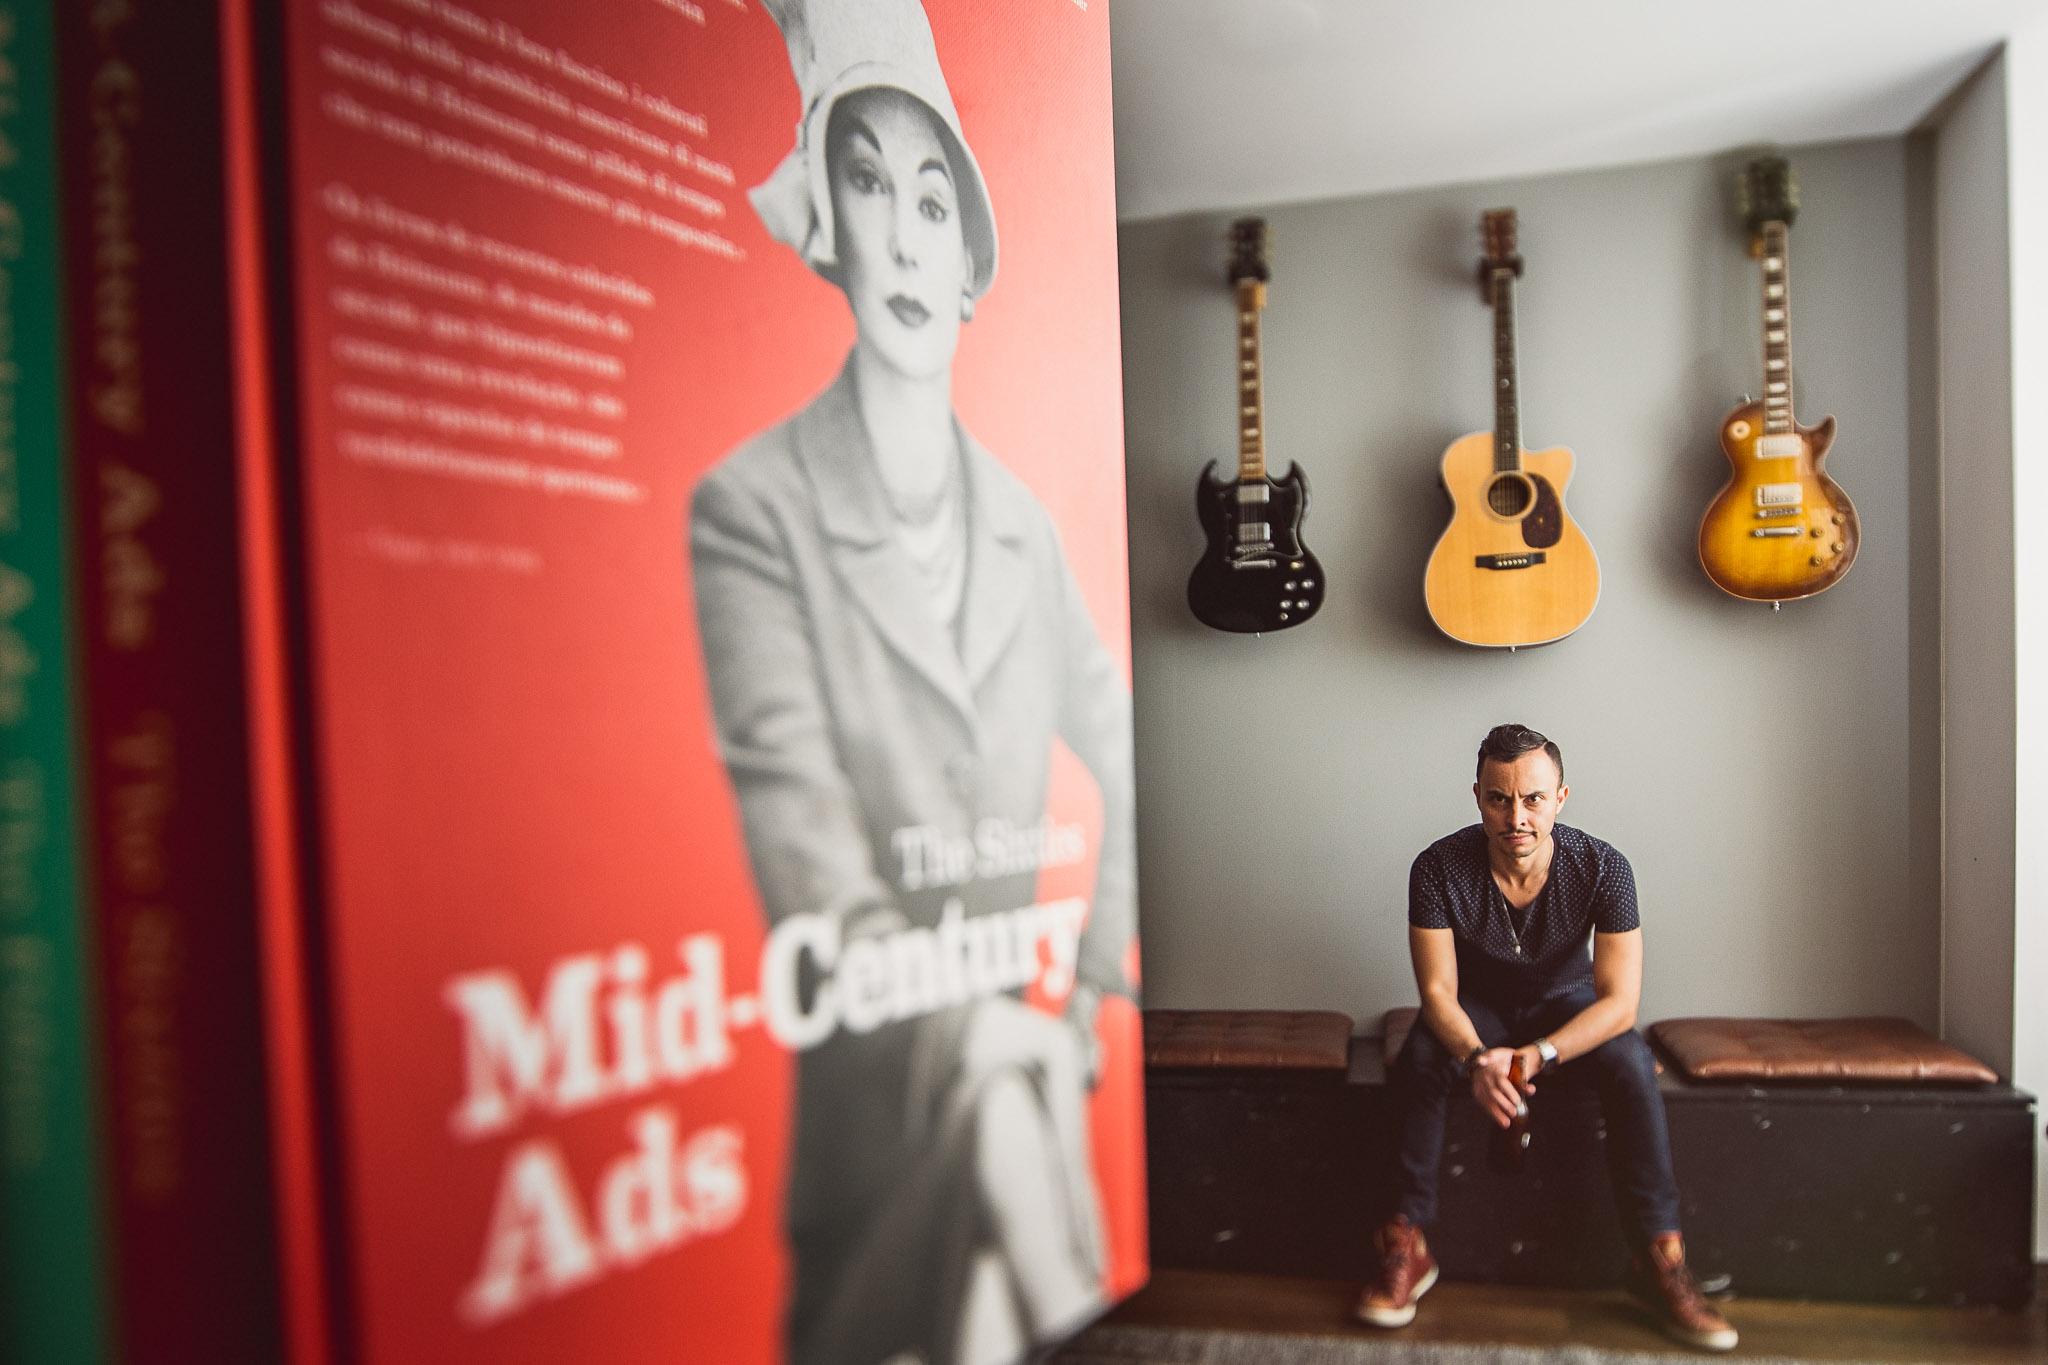 Taylor-guitar-advertising-portrait-brooks-hipster-fotografo-mexico-retrato-MaurizioSolisBroca.Photography150706DSC02819-Edit.jpg